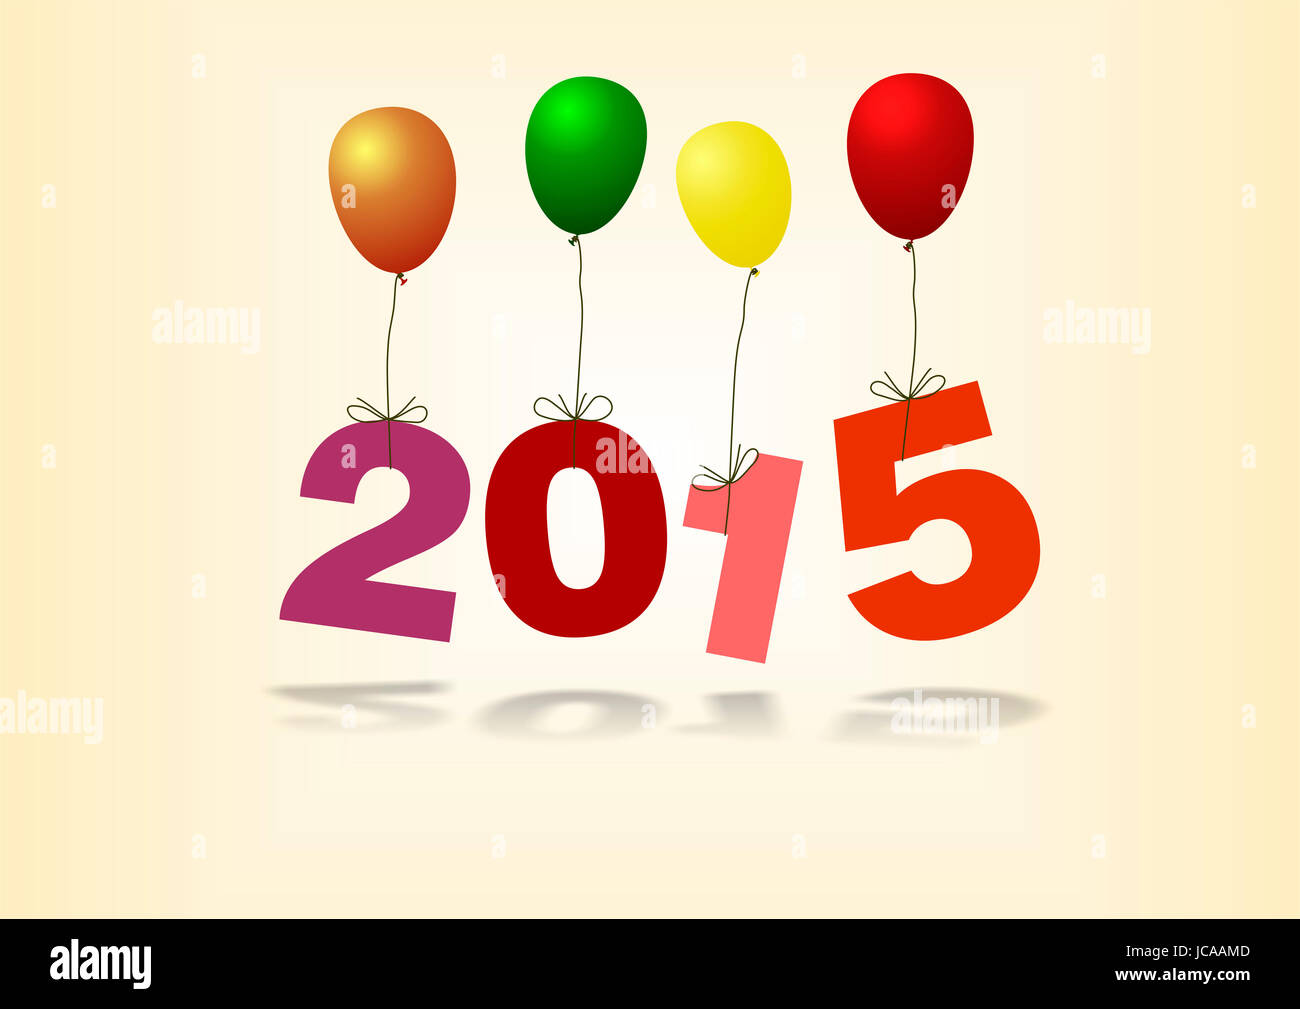 Jahreszahl 2015 hängt an bunten Luftballons - Stock Image